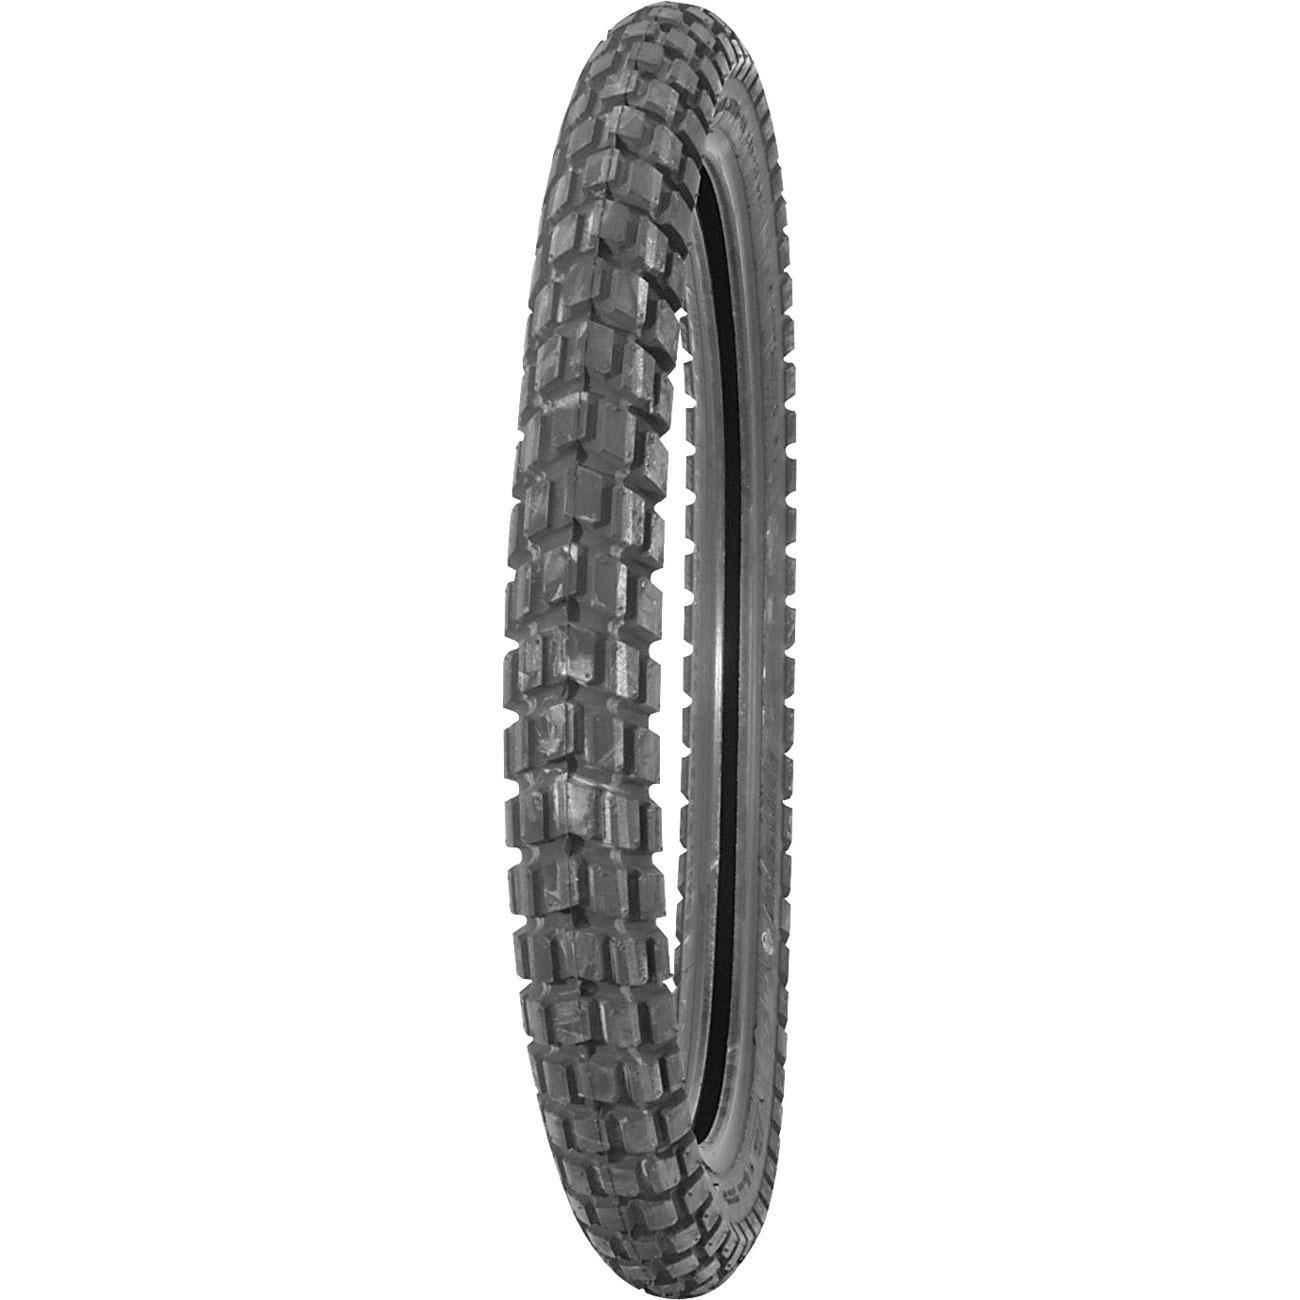 Bridgestone Trail Wing TW41 Dual//Enduro Front Motorcycle Tire 80//100-21